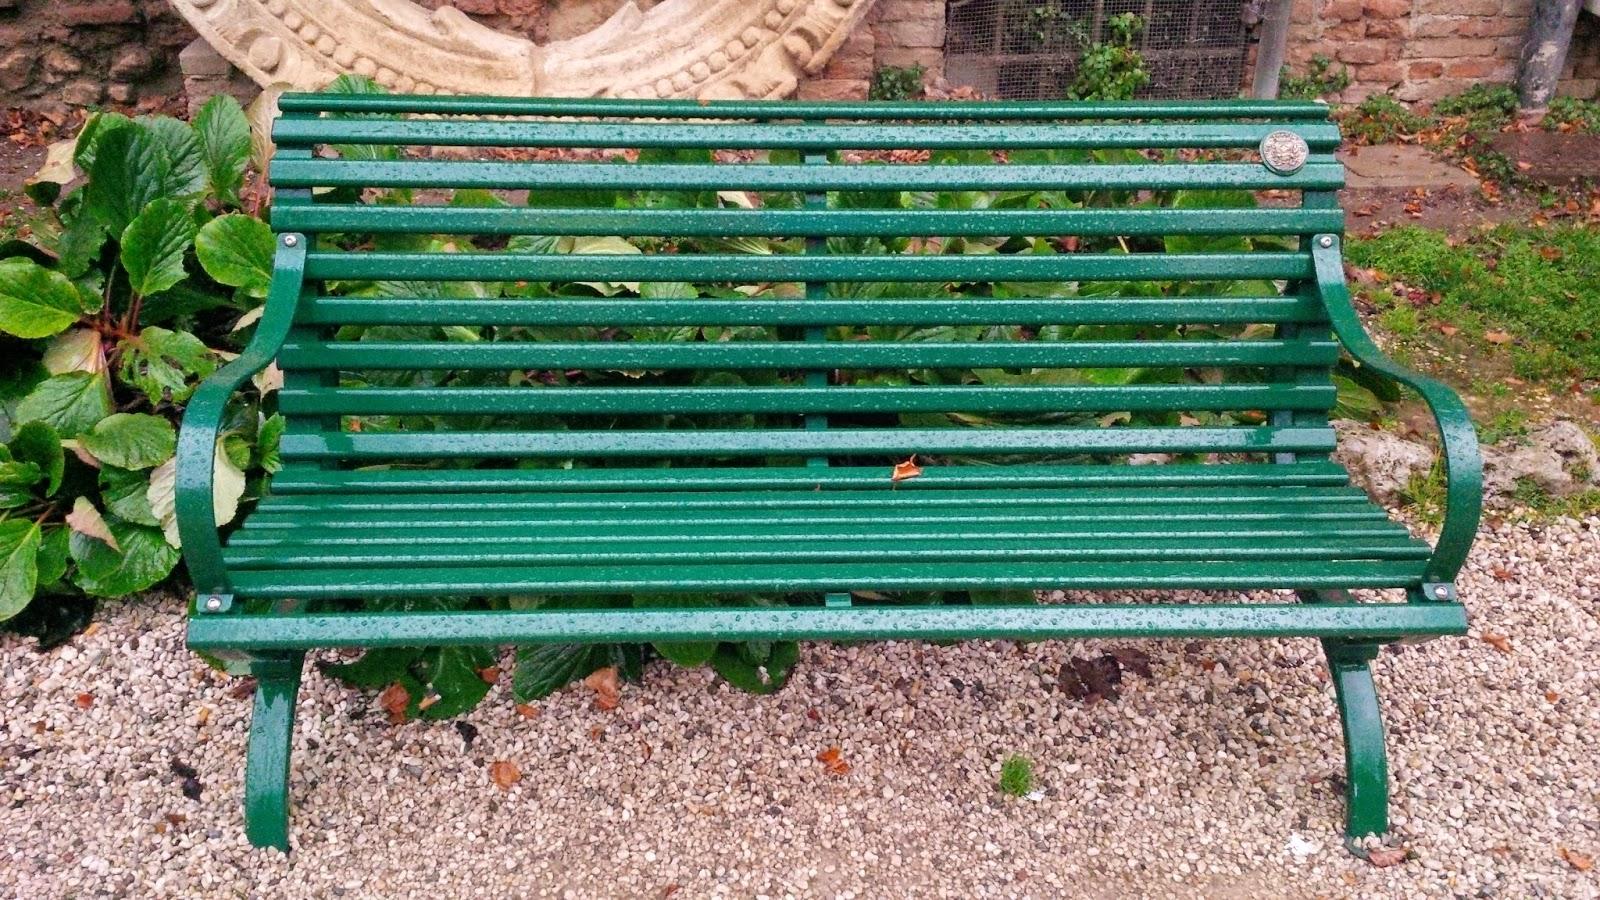 wet bench torrential rain garden Teatro Olimpico Vicenza